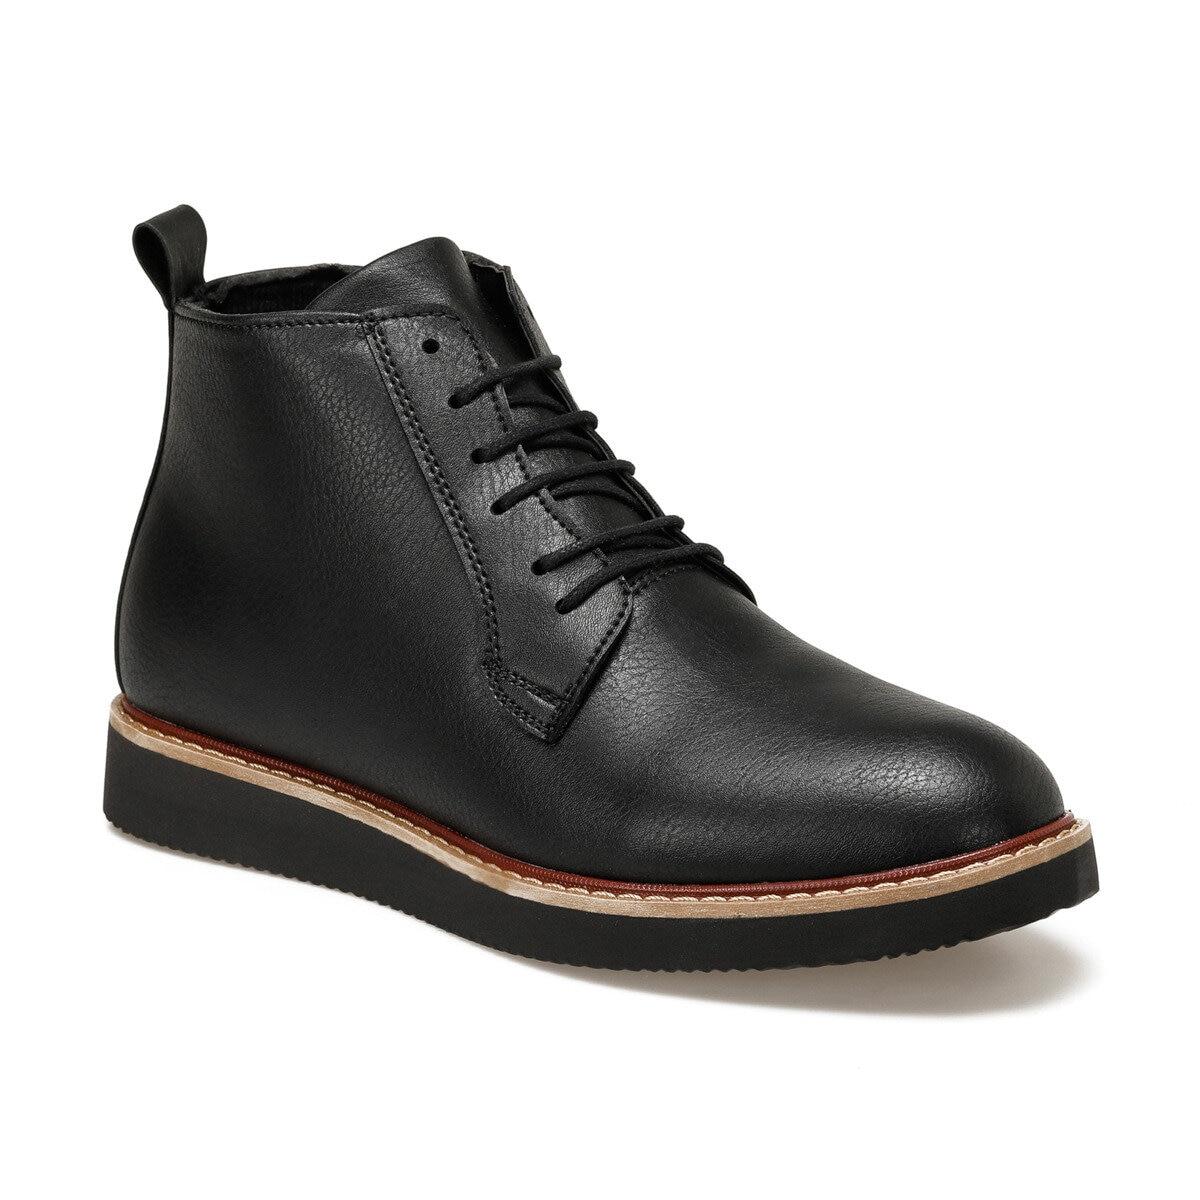 Flo 3321-2 botas de homem preto jj-stiller